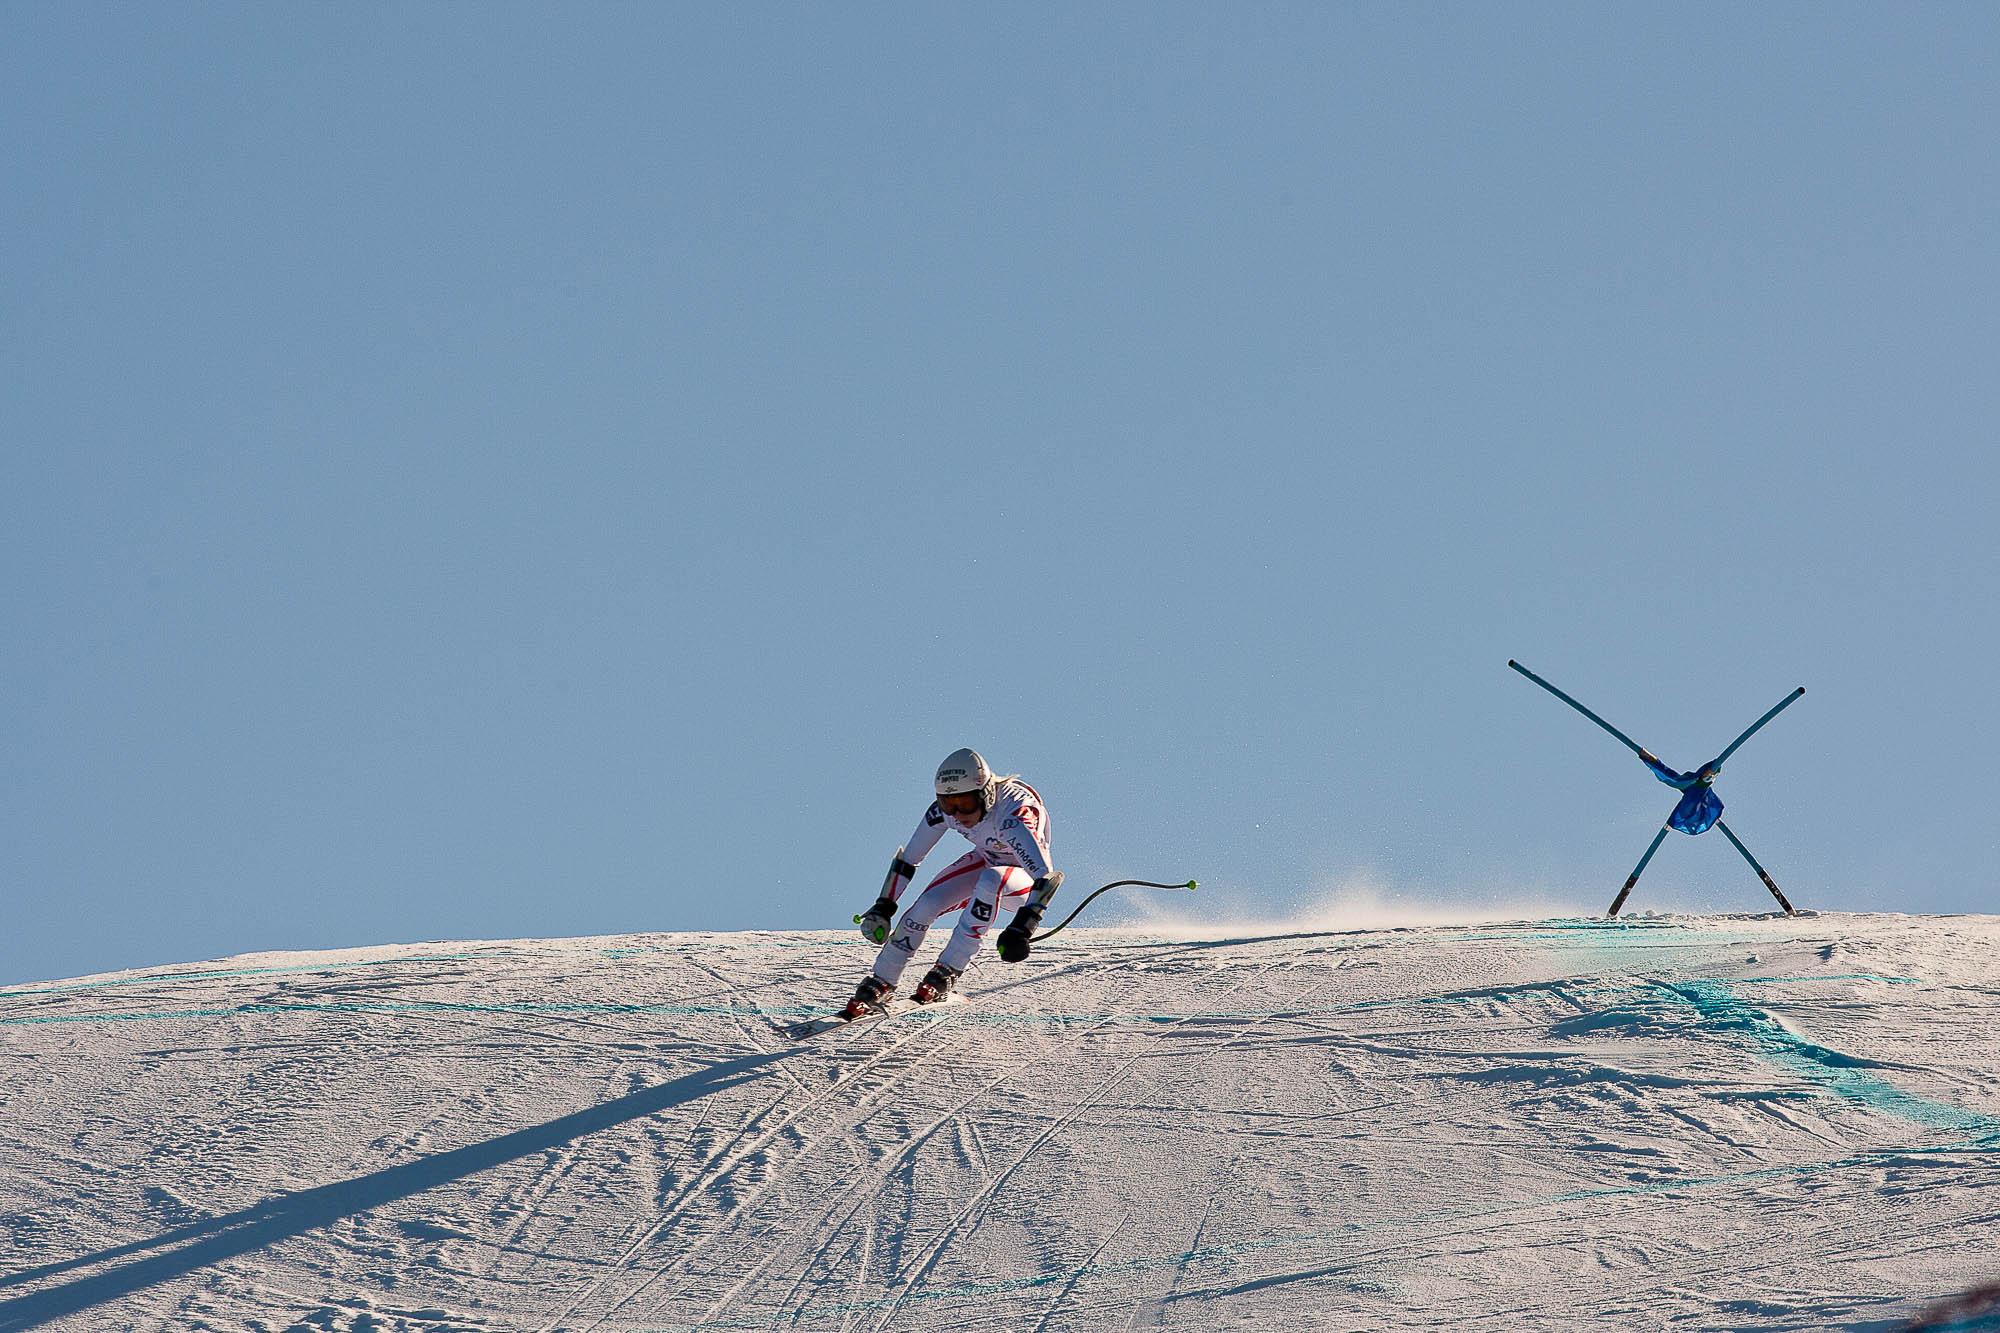 Coupe_Europe_ski_dames-49.jpg